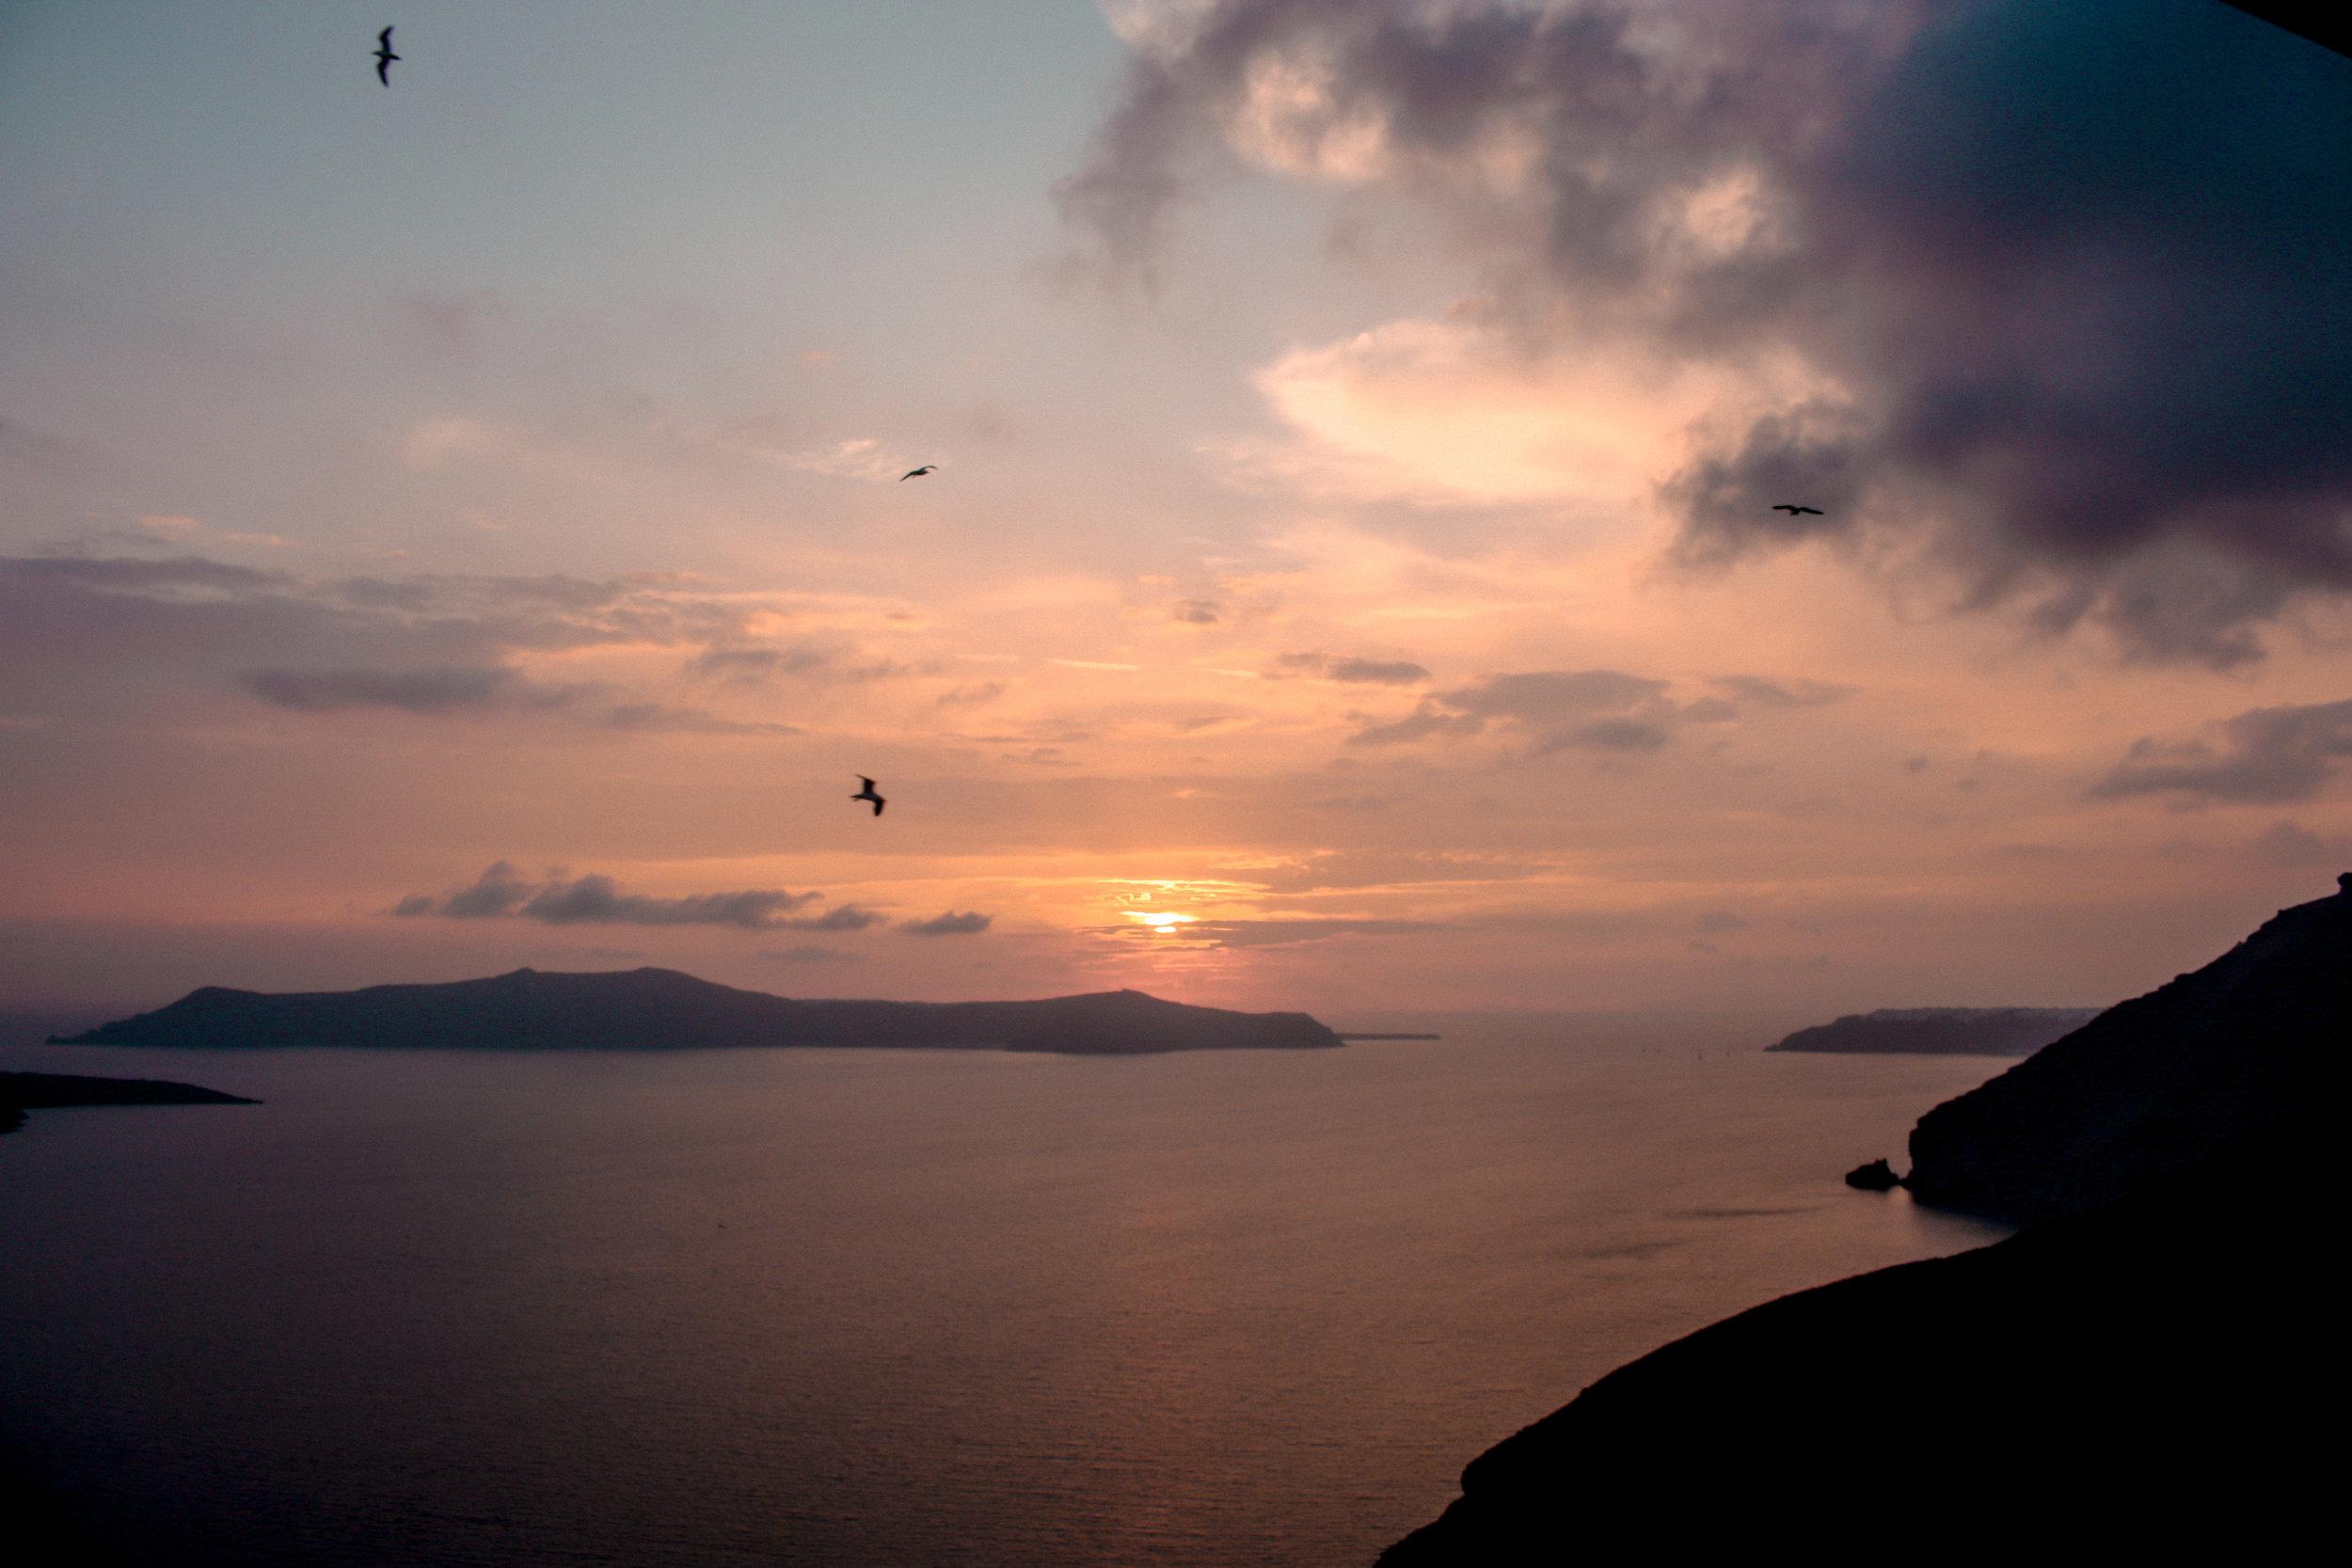 Santorini_thekikogirl_05